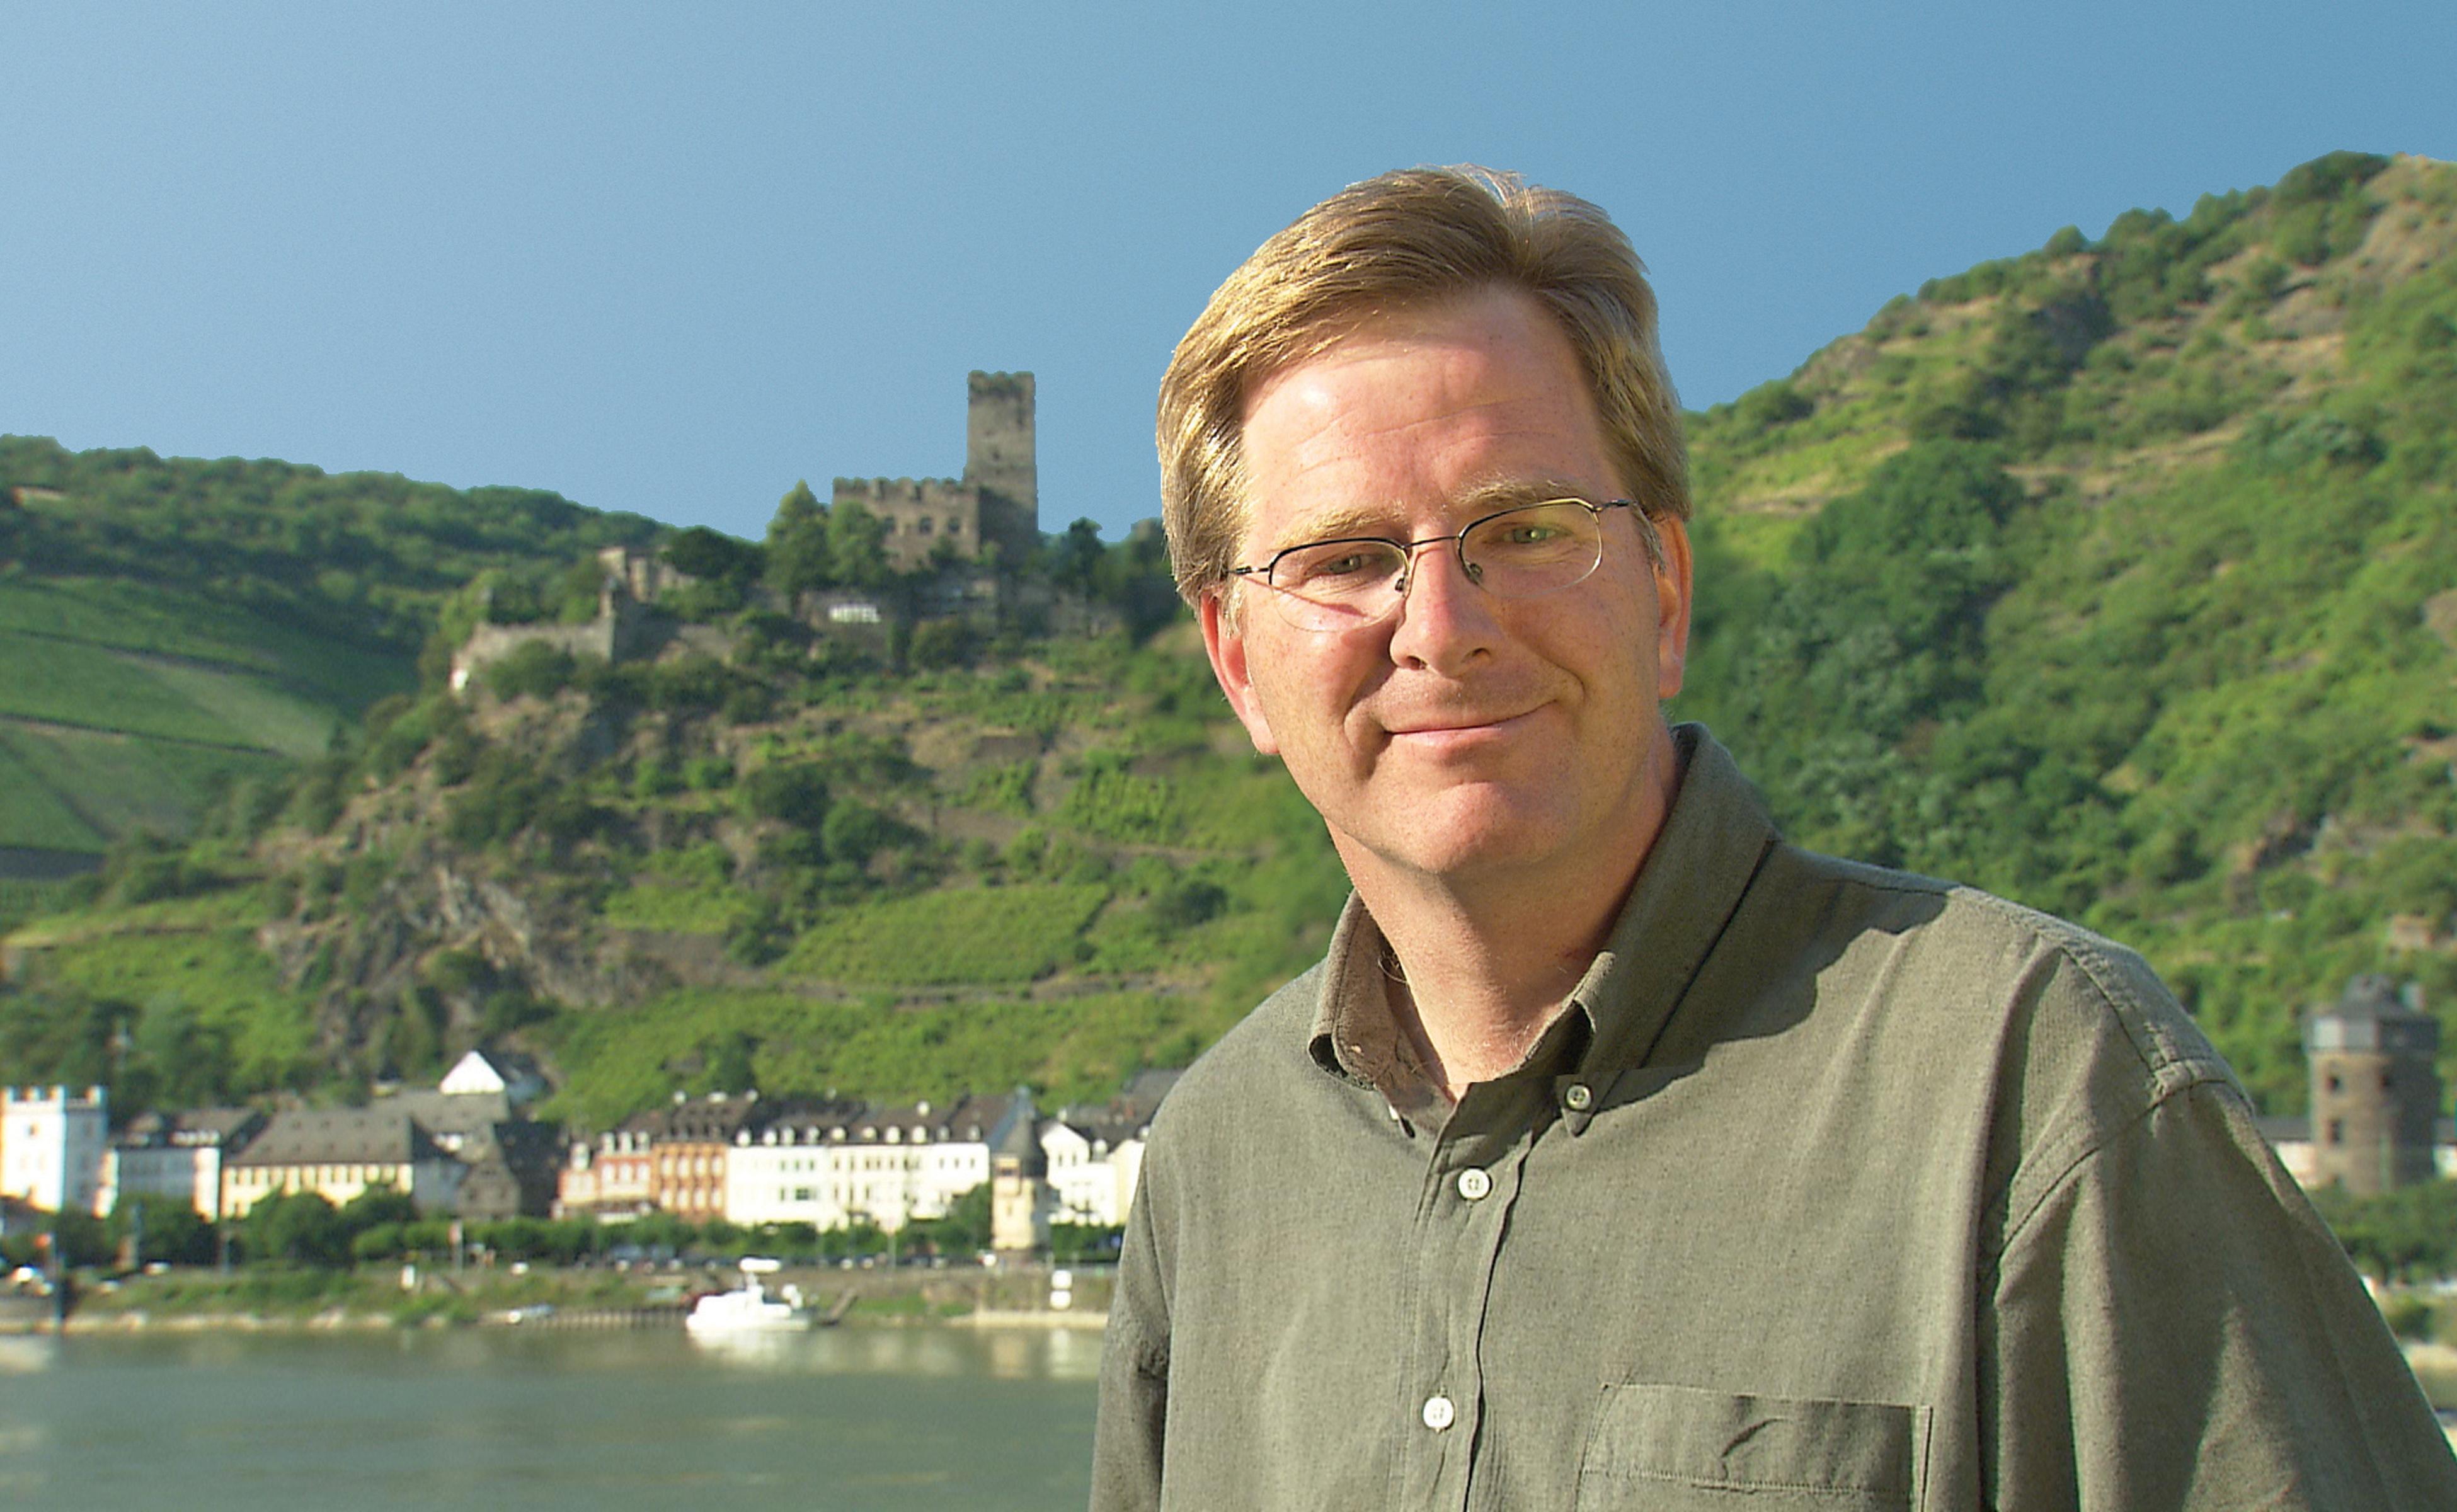 Rick Steves on the Rhine River in Germany.